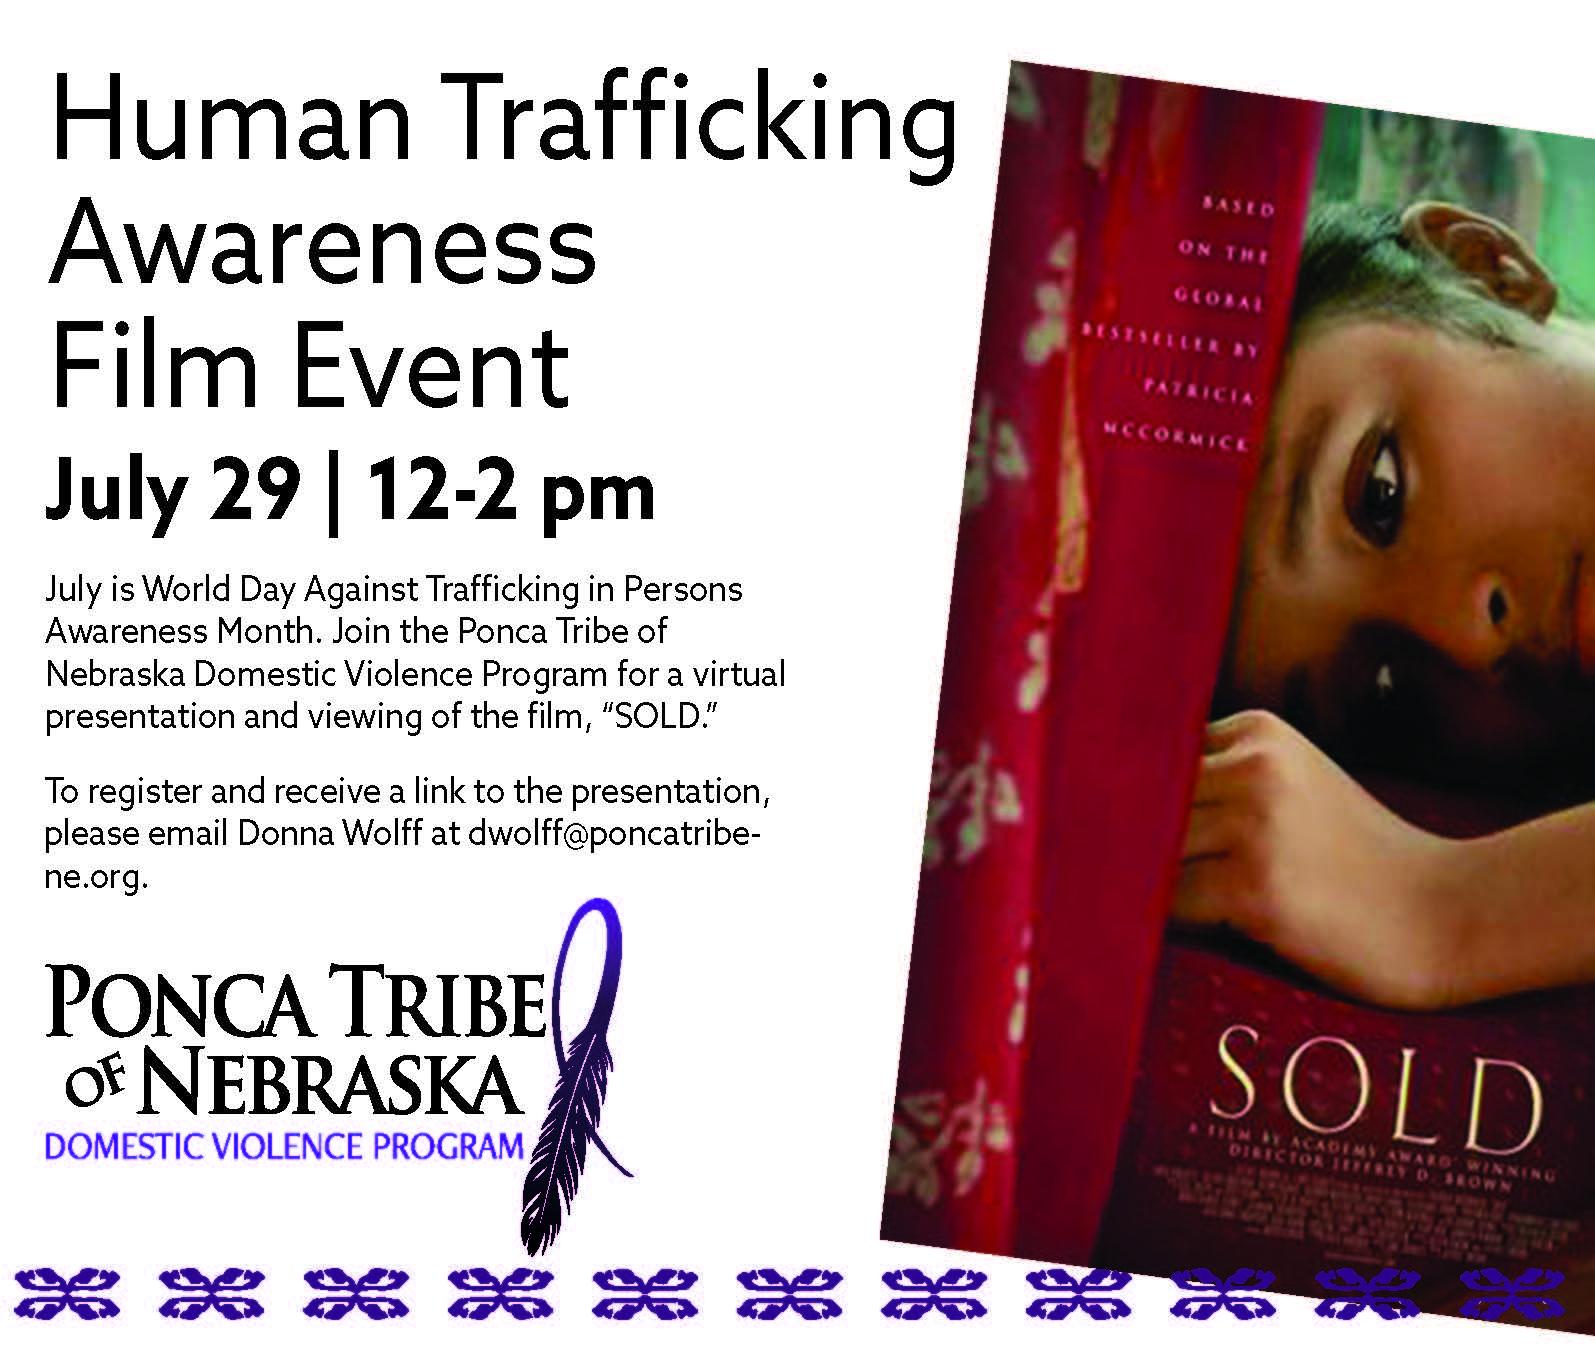 Human Trafficking Awareness Film Event